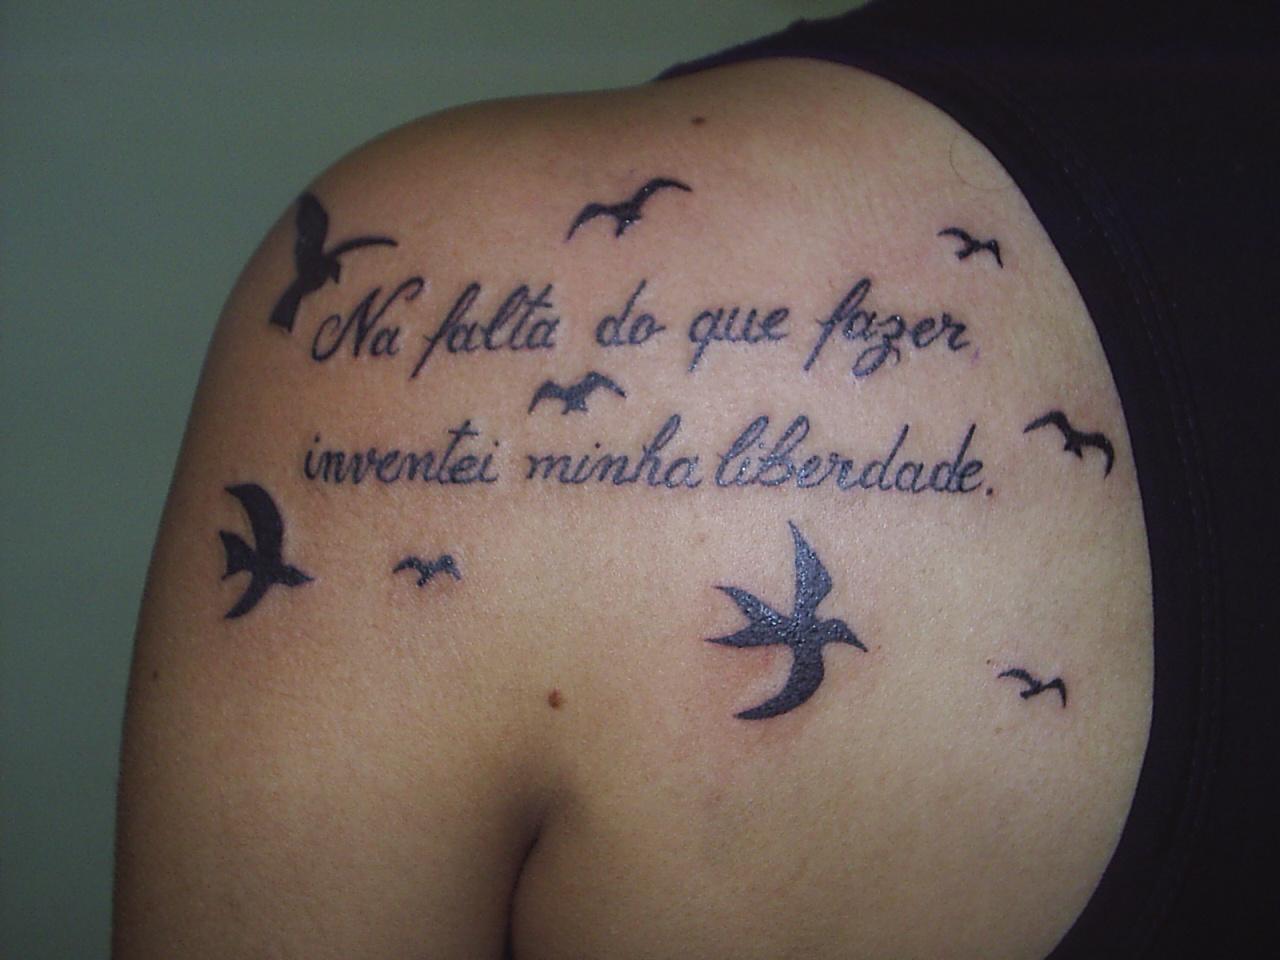 Tattoo frase com gaivotas cliente rafaela cultura e liberdade tattoo frase com gaivotas cliente rafaela thecheapjerseys Image collections